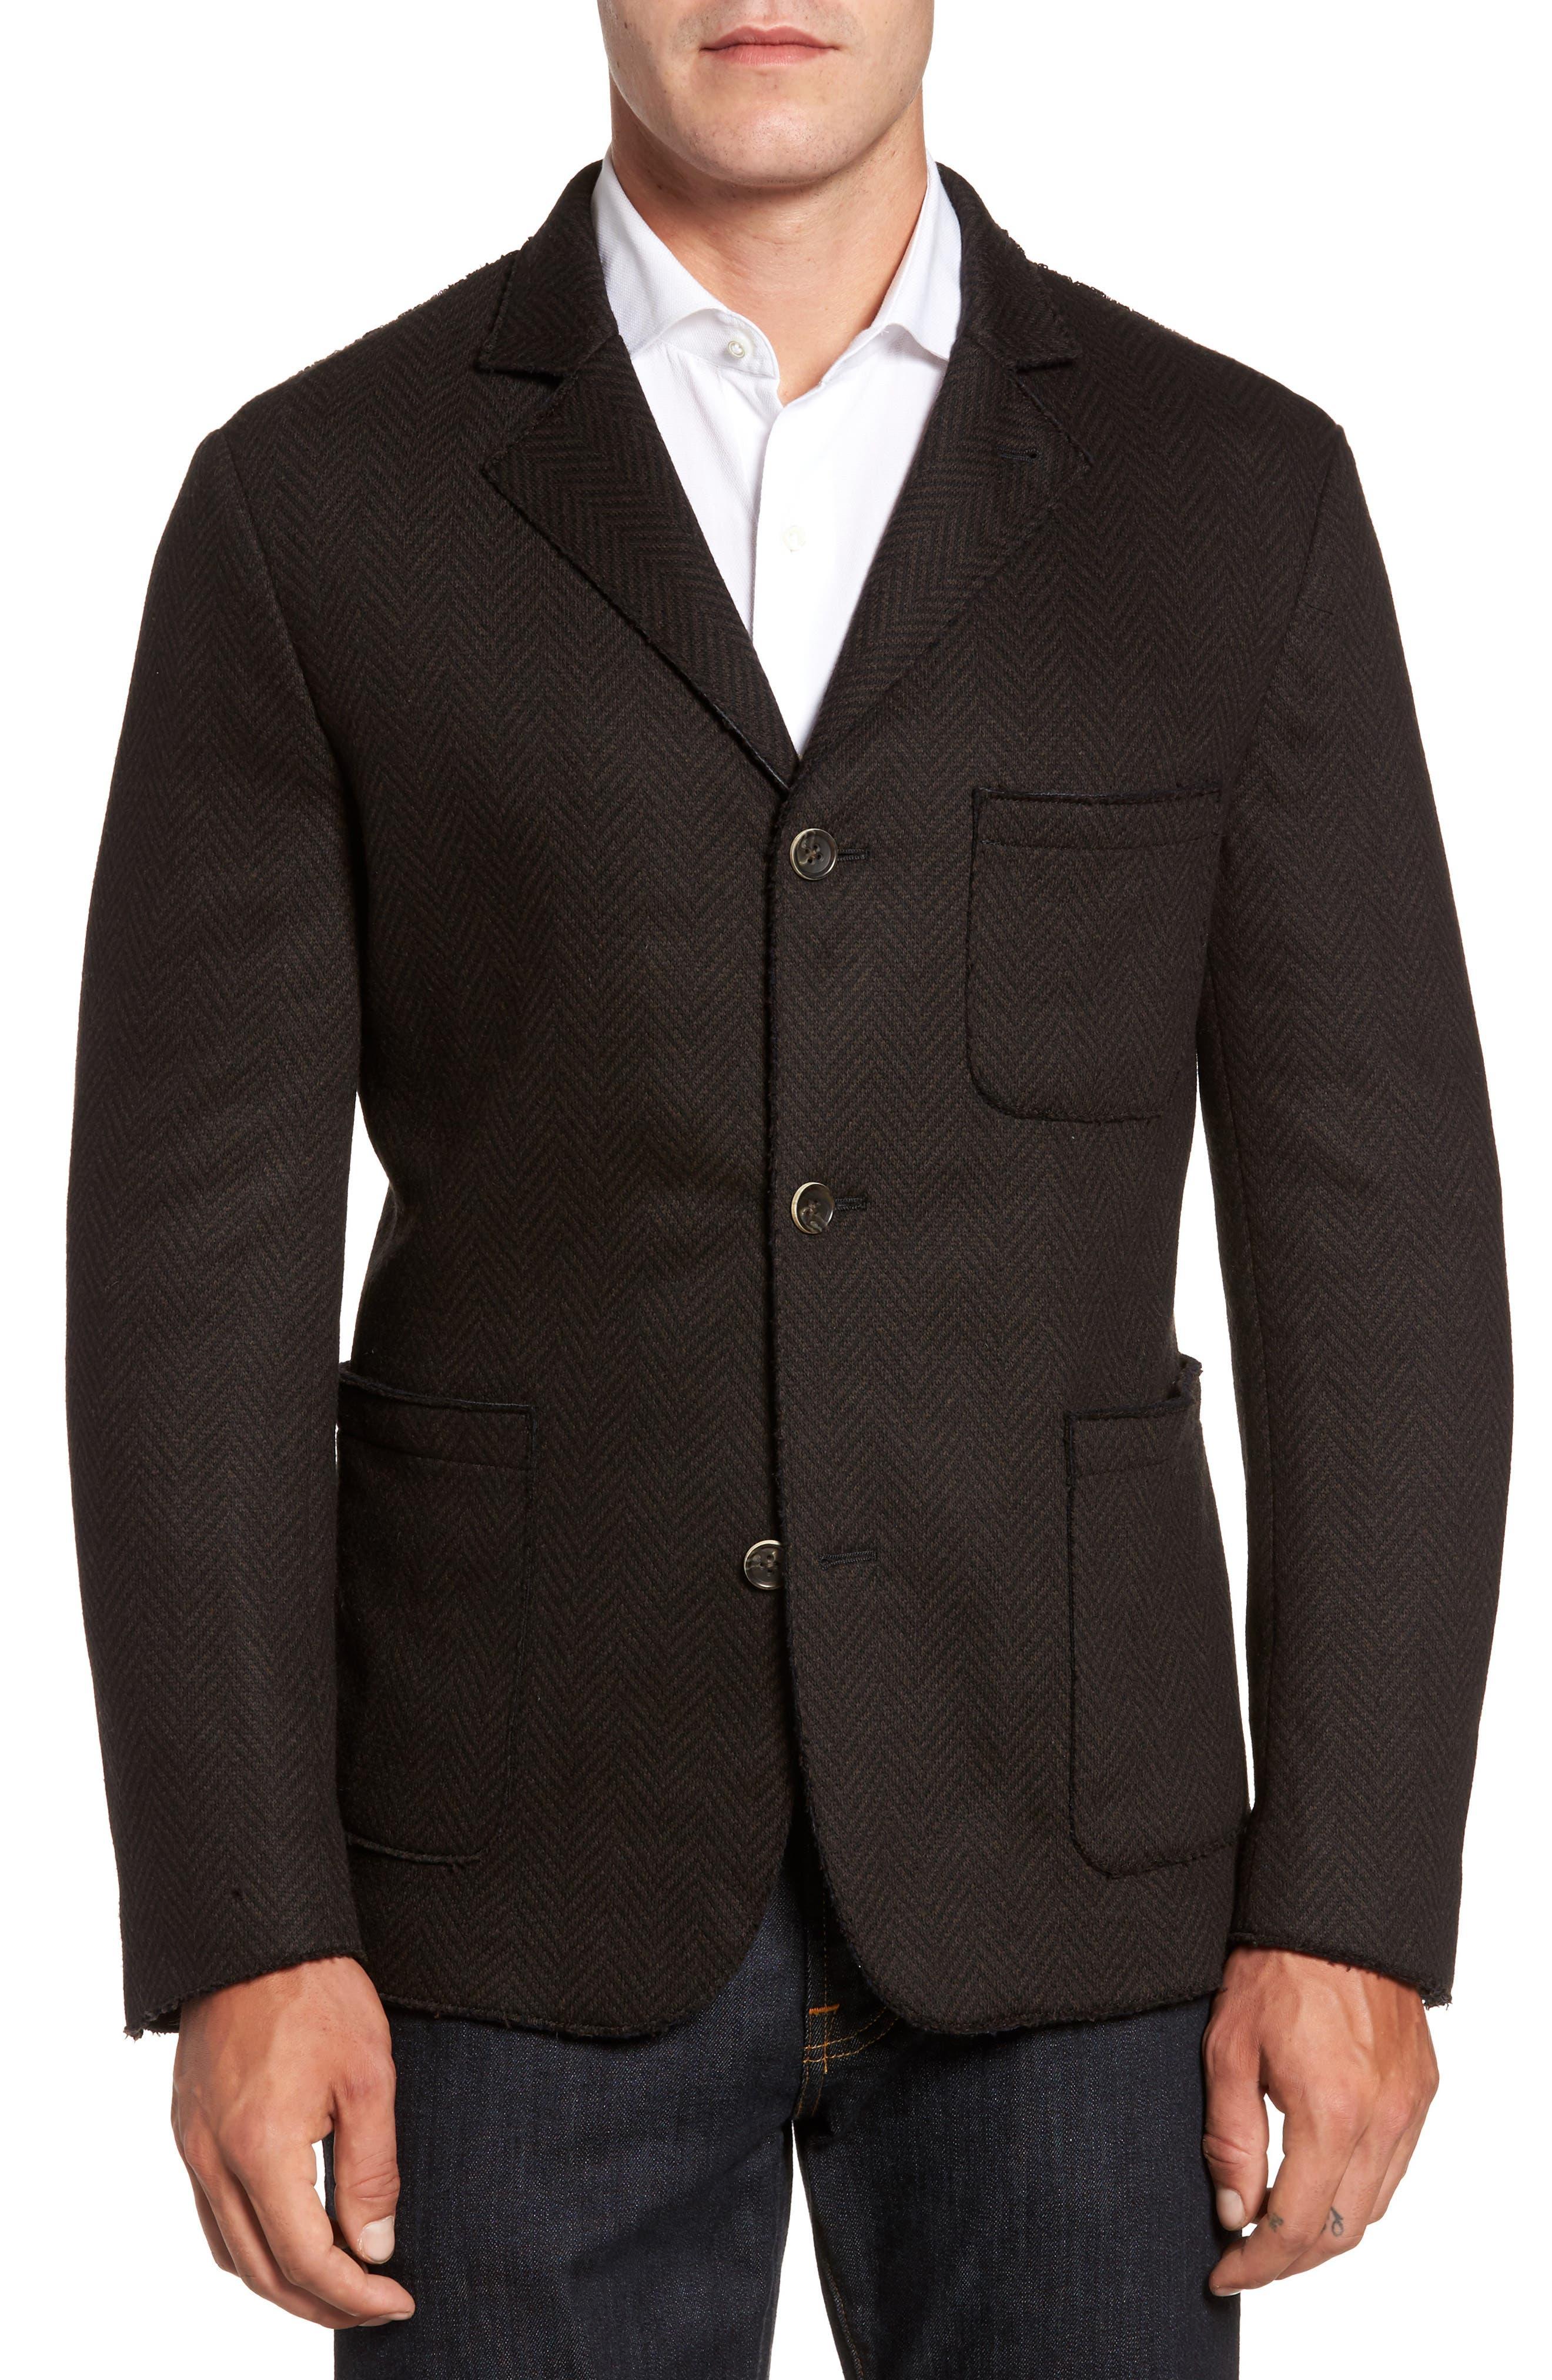 Laser Edge Wool Blend Jersey Sport Coat,                             Main thumbnail 1, color,                             201